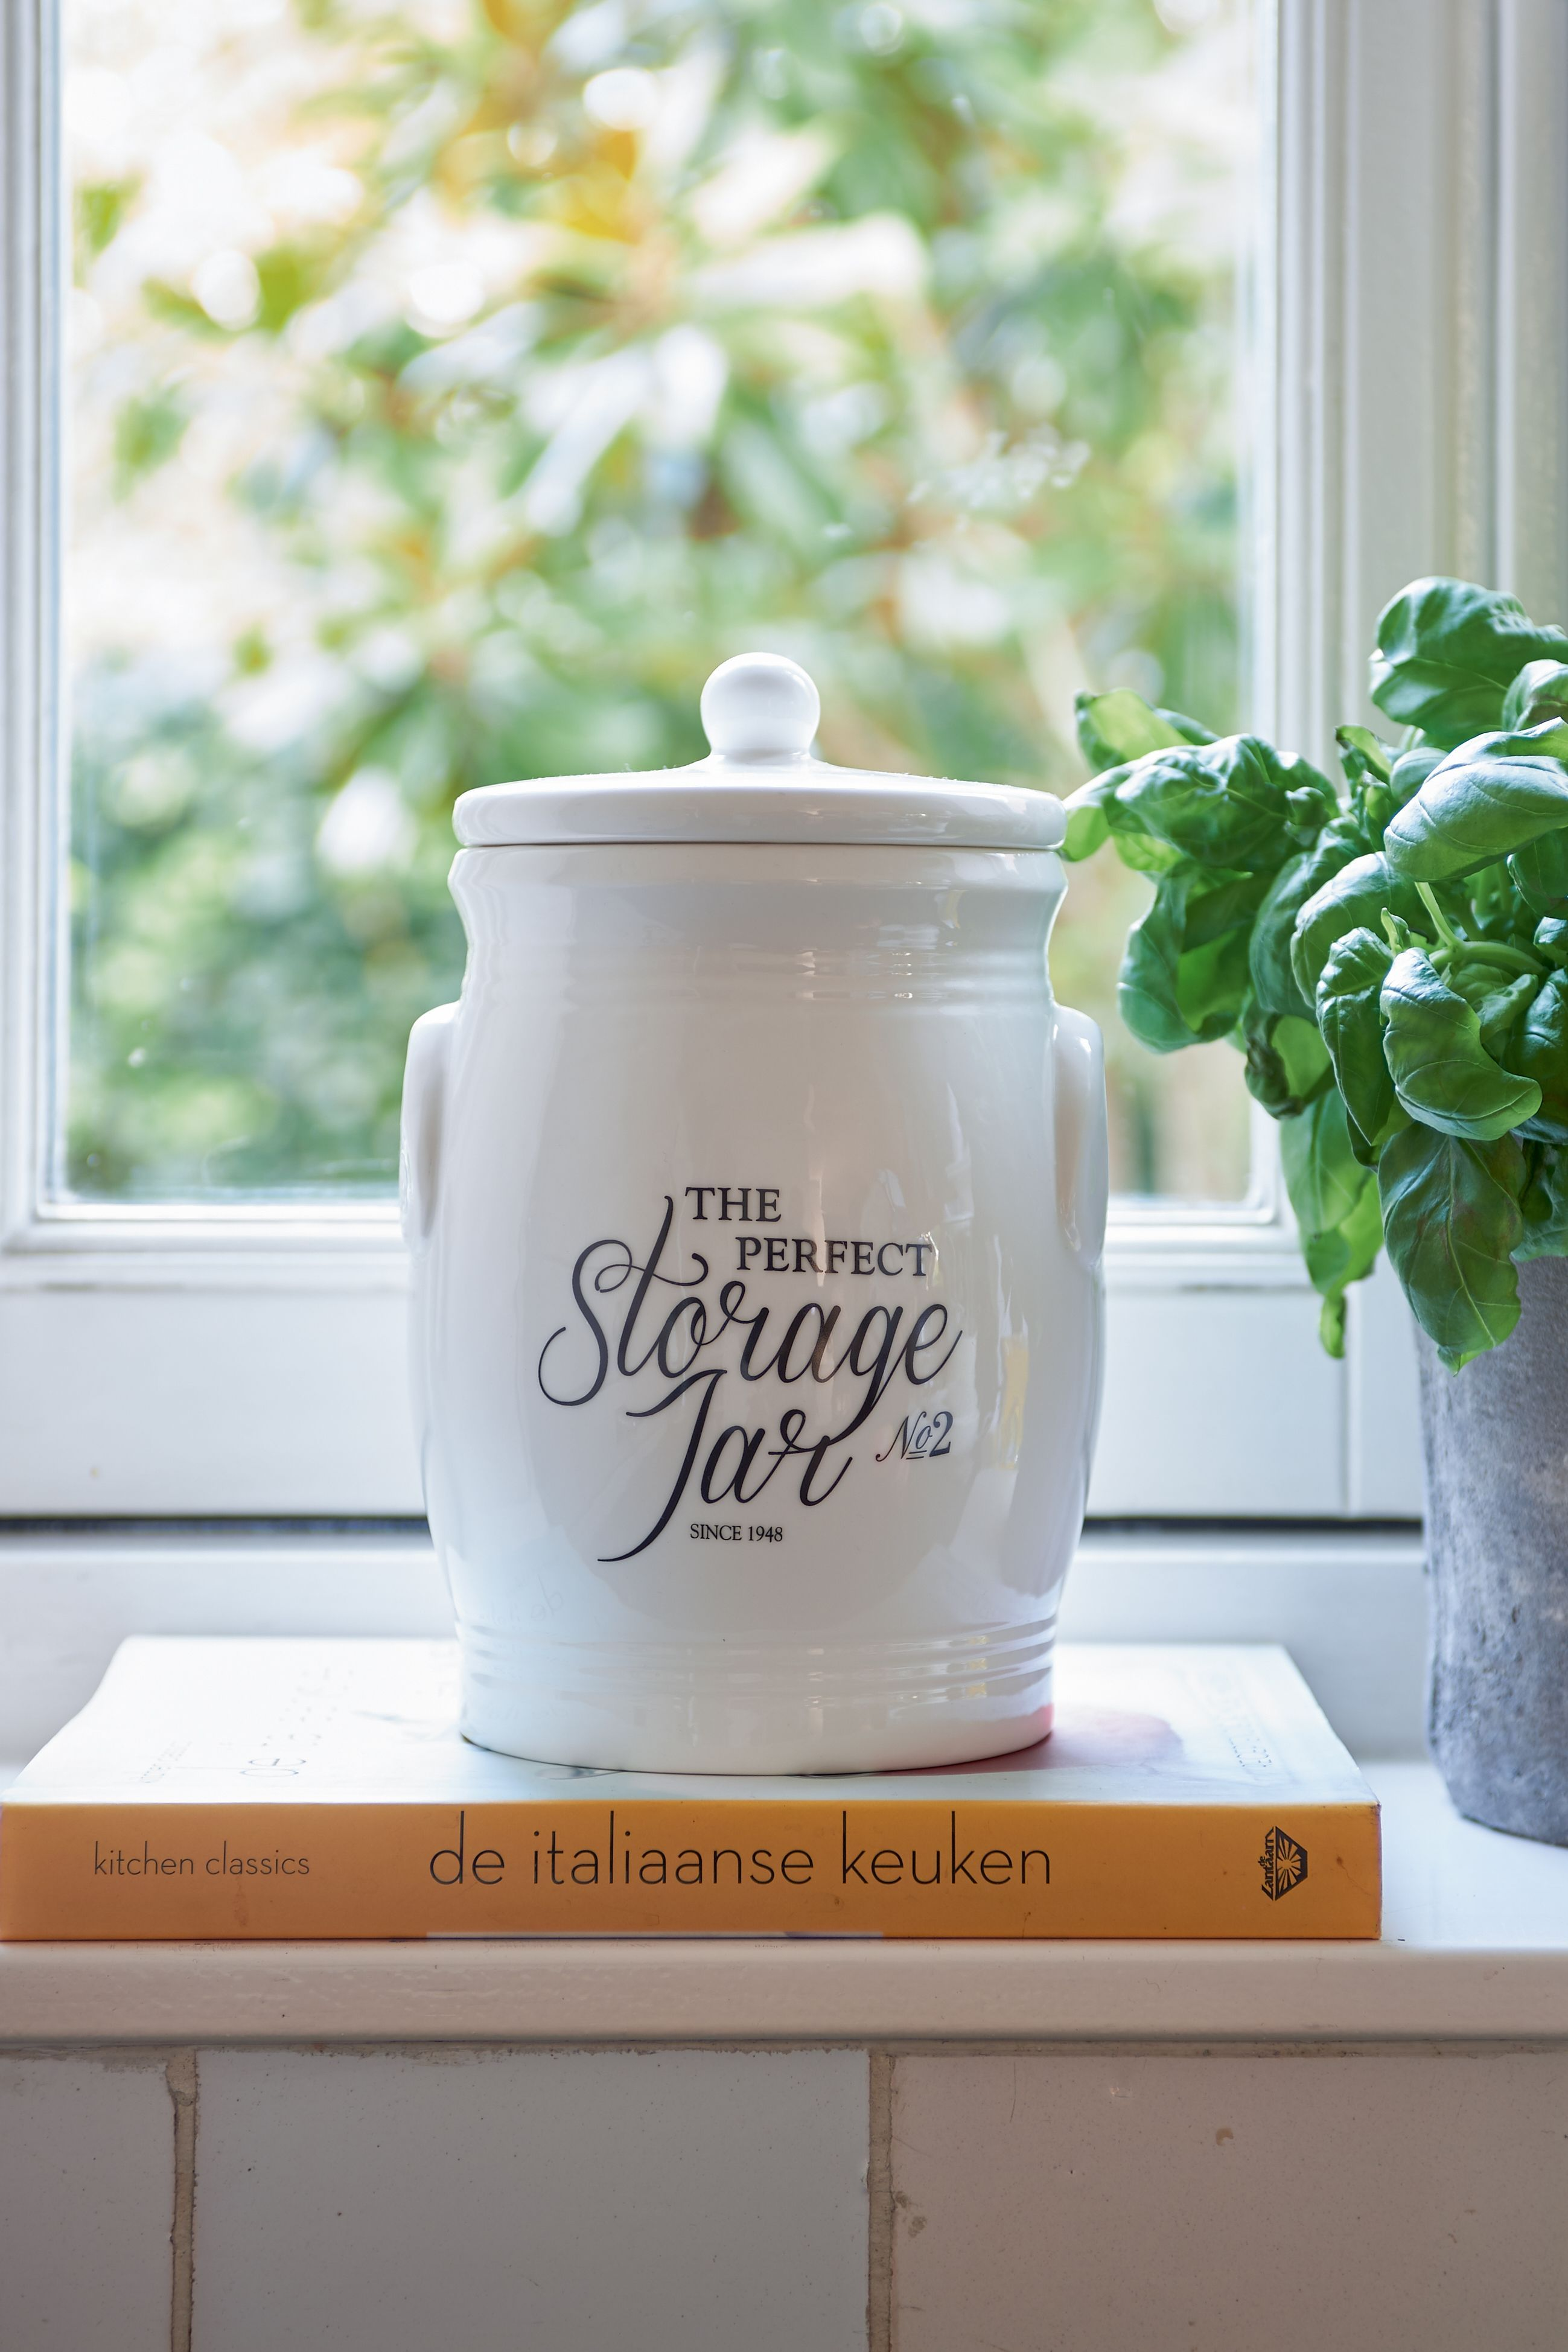 Dóza The Perfect Storage Jar M